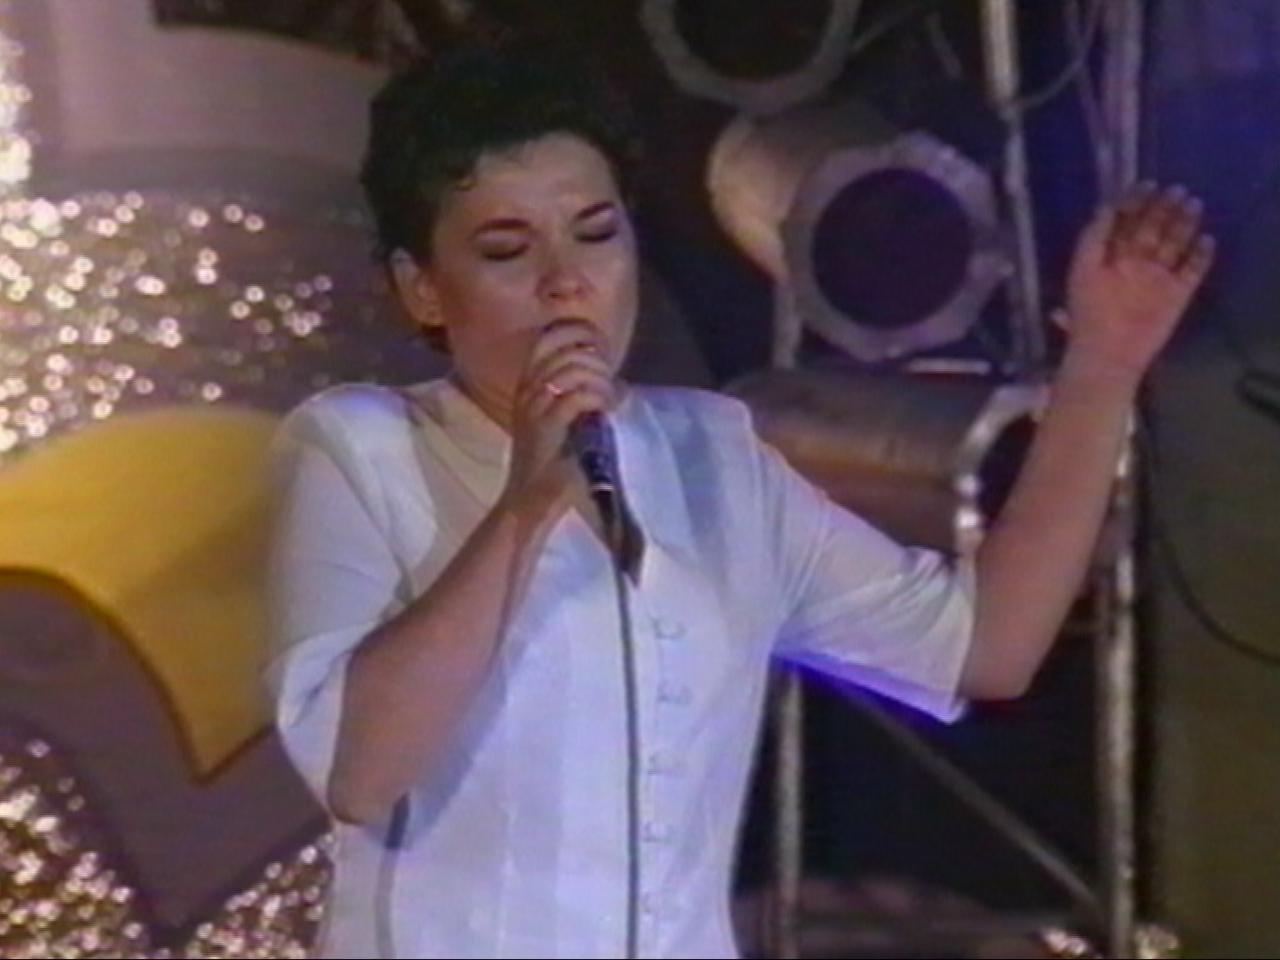 Amara 1998 - Trofeul - Roxana Iacob.jpg